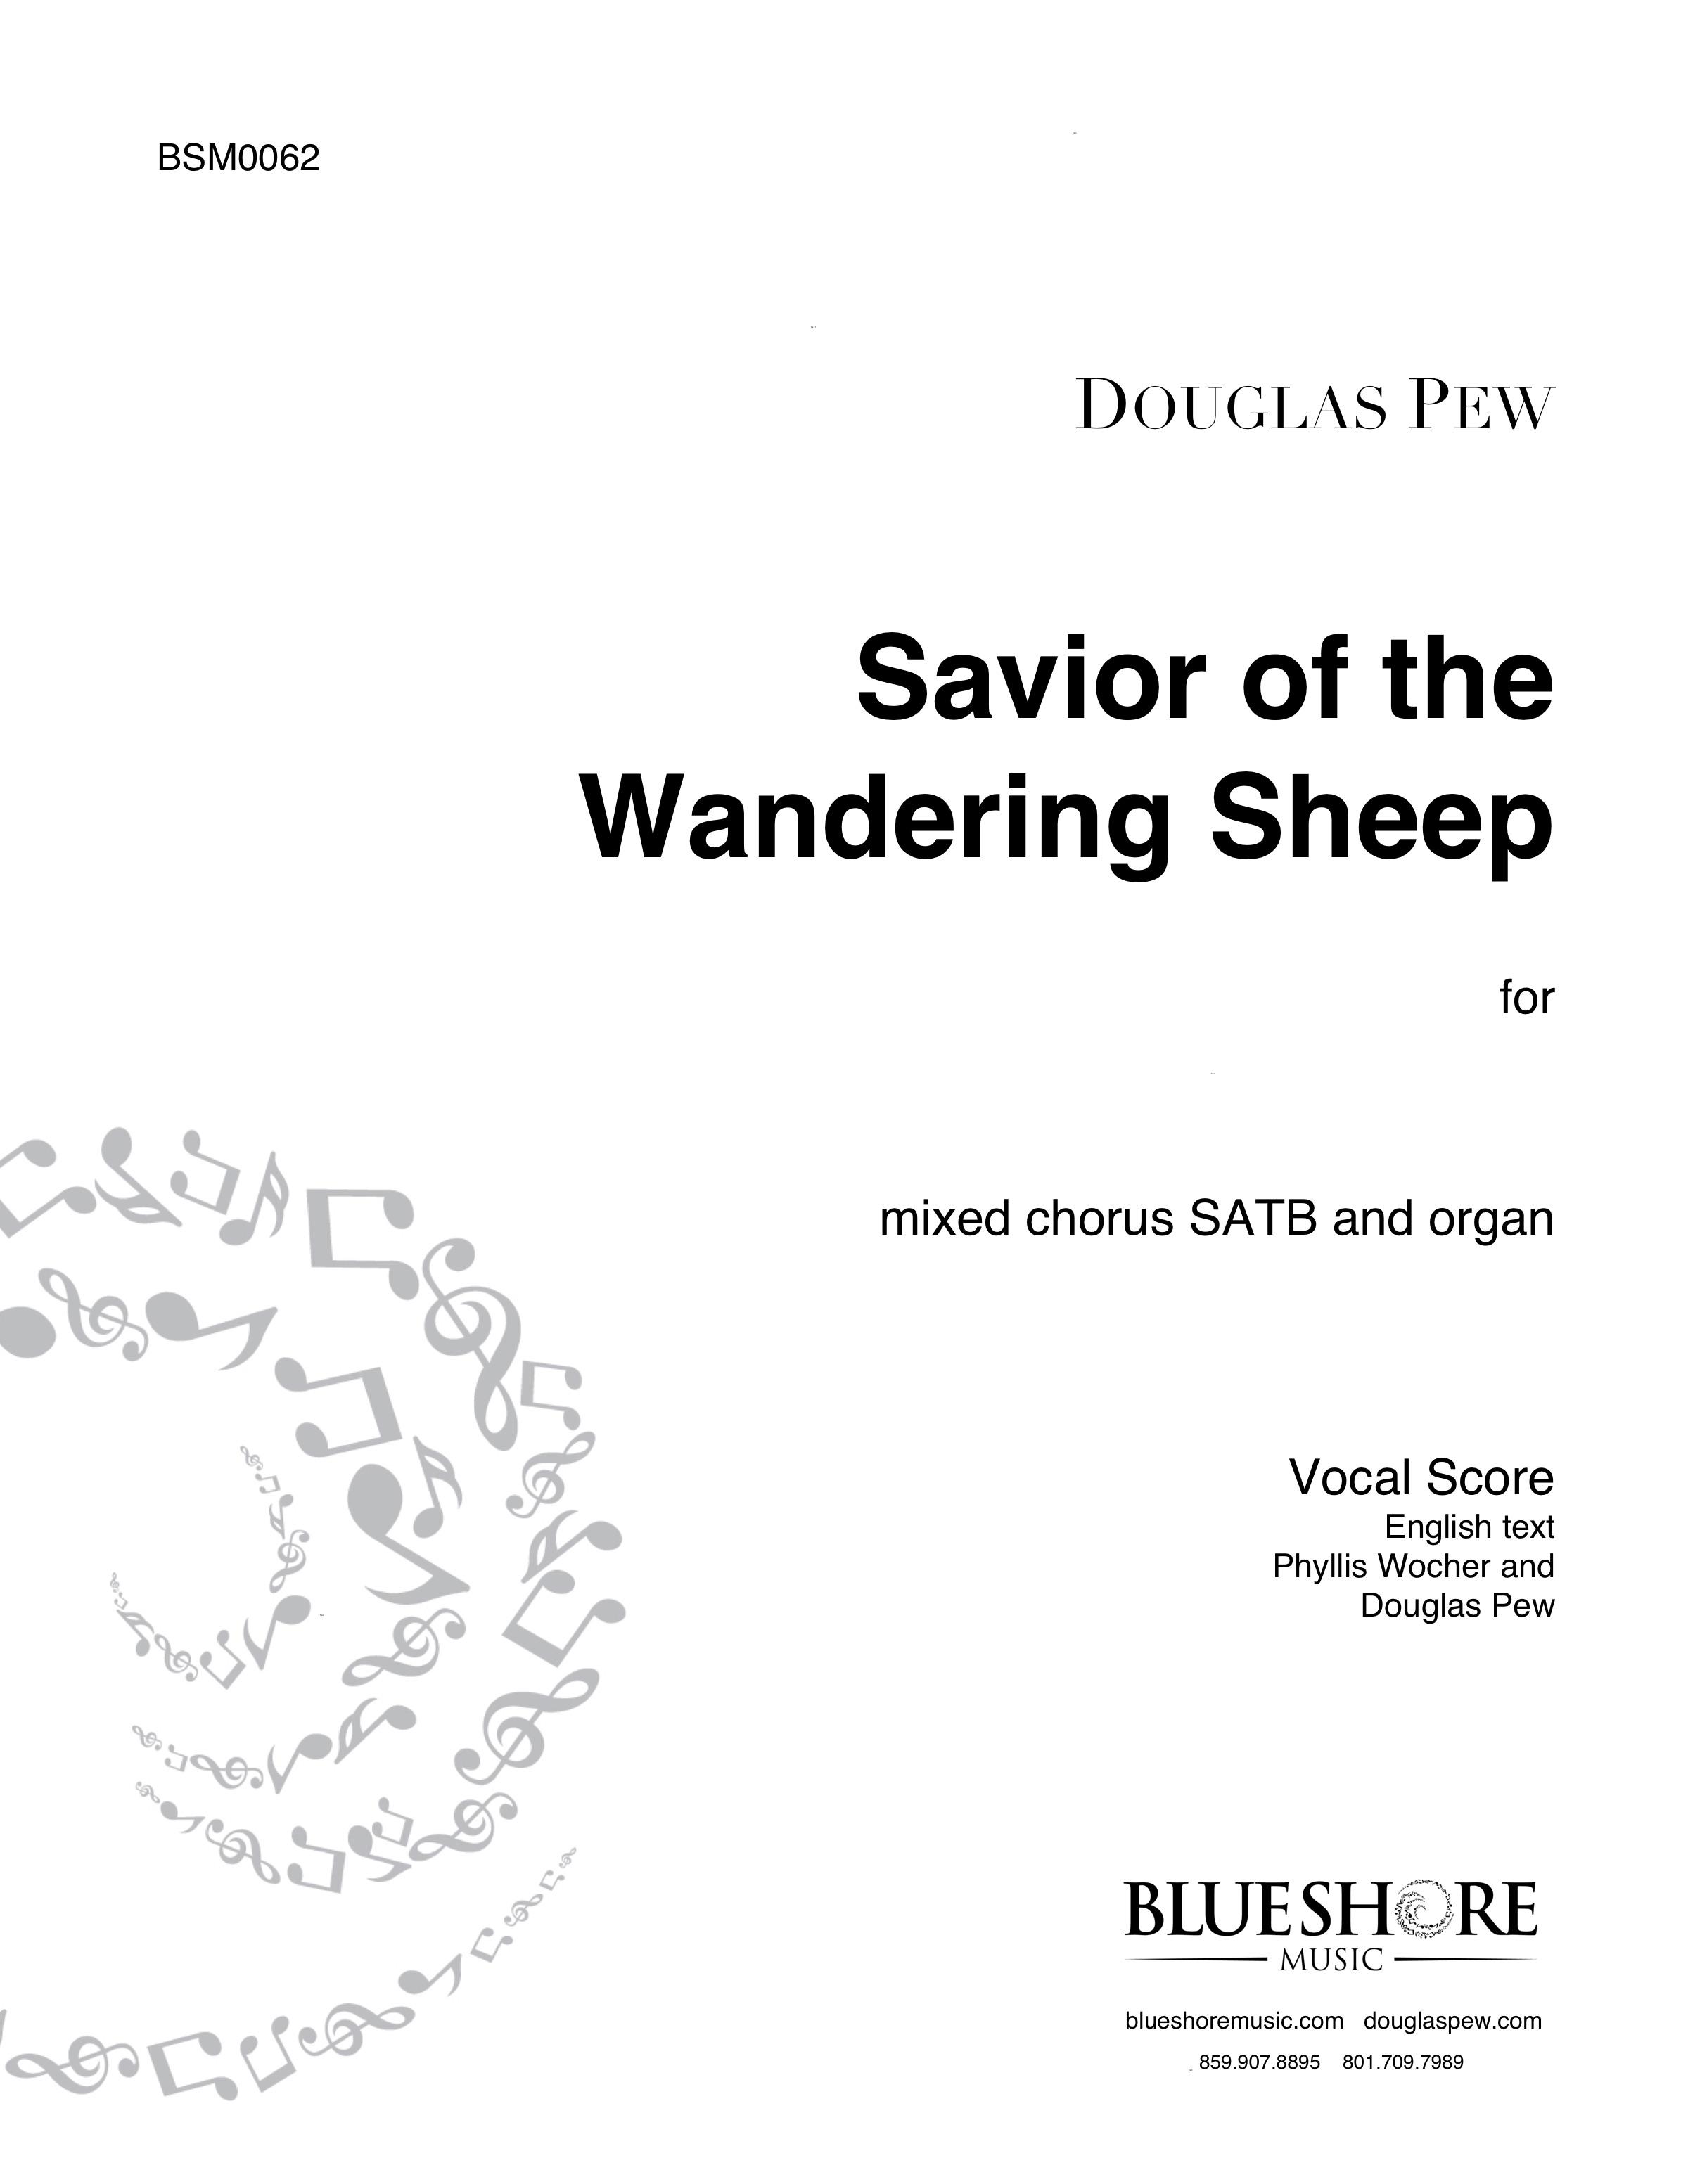 Savior Of The Wandering Sheep  - *COMING SOON*